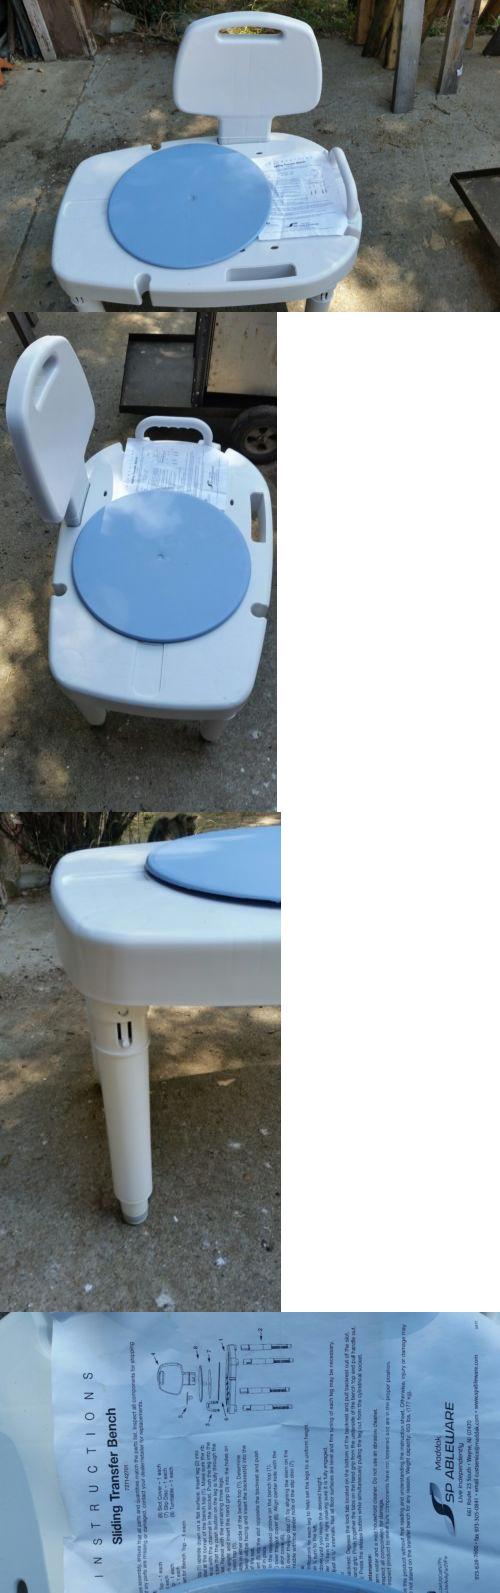 Transfer Boards and Benches: Maddak Bath Sliding Transfer Bench ...